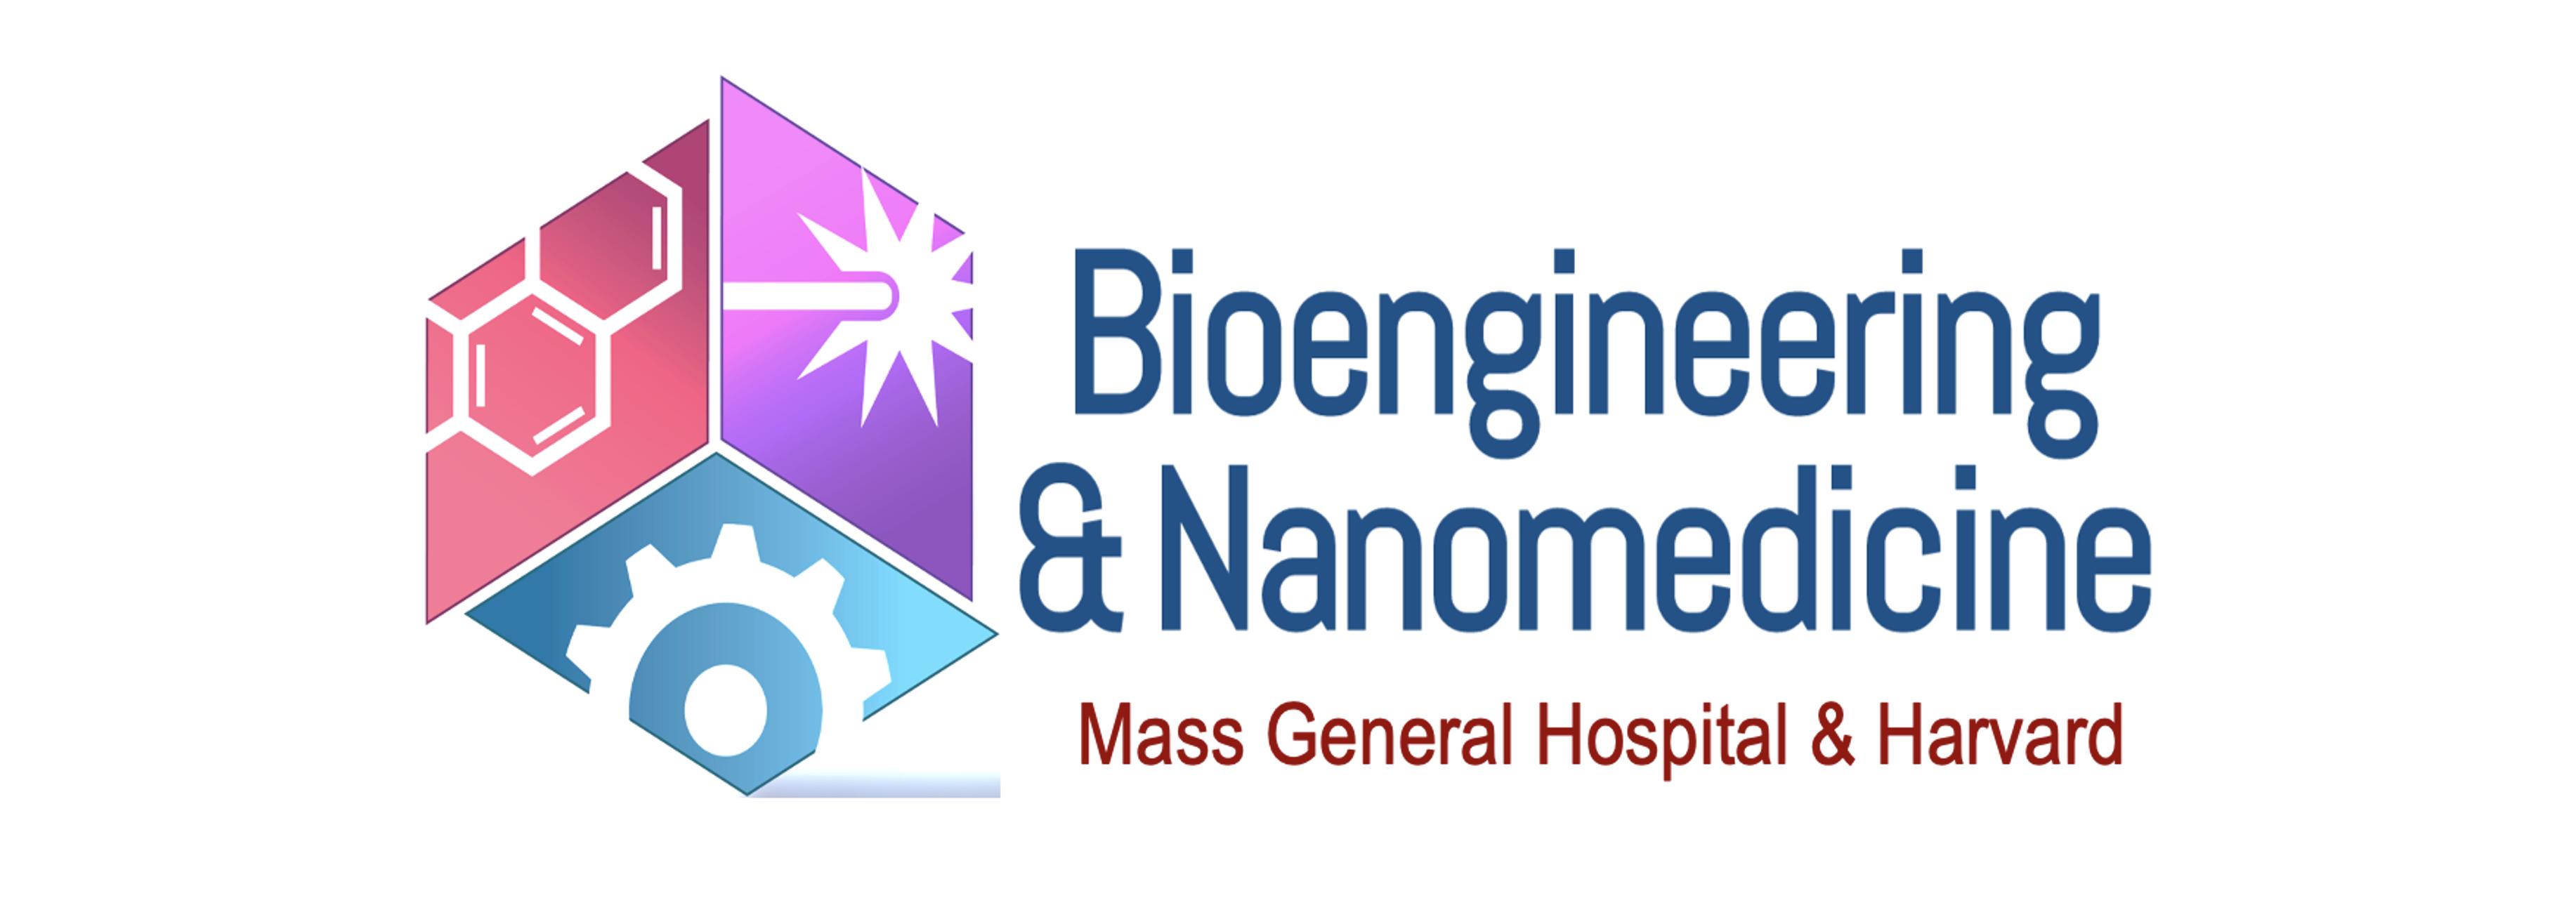 Bioengineering & Nanomedicine Program at MGH